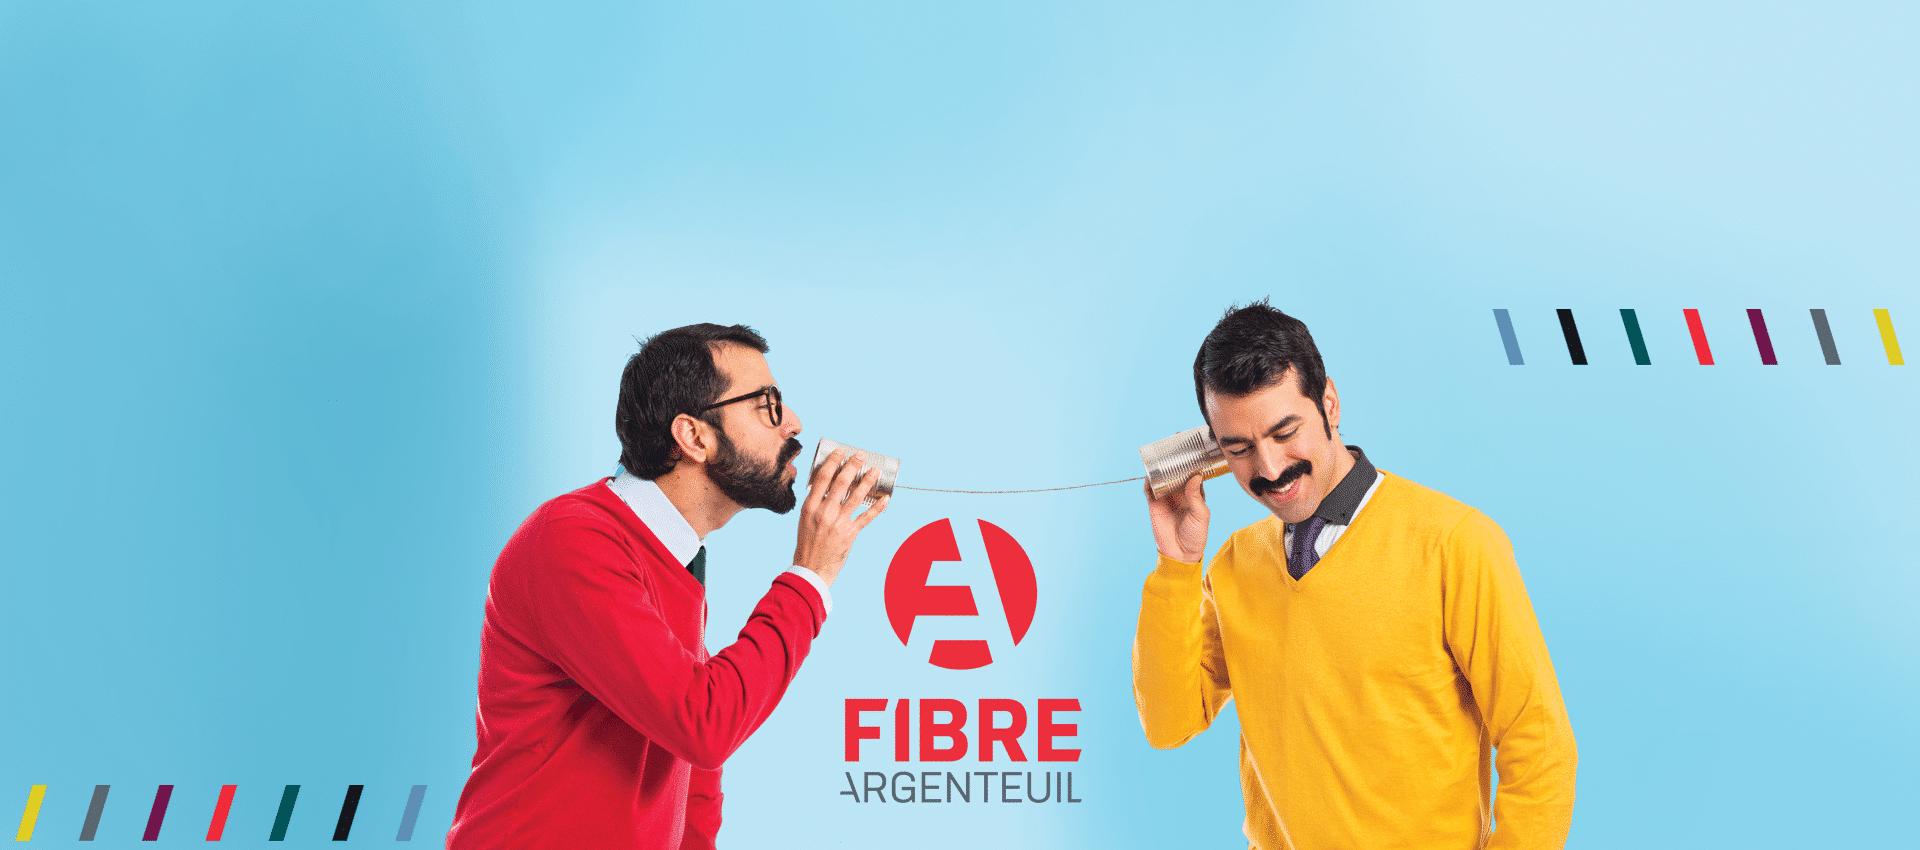 https://fibreargenteuil.ca/wp-content/uploads/2020/06/contact-2.png